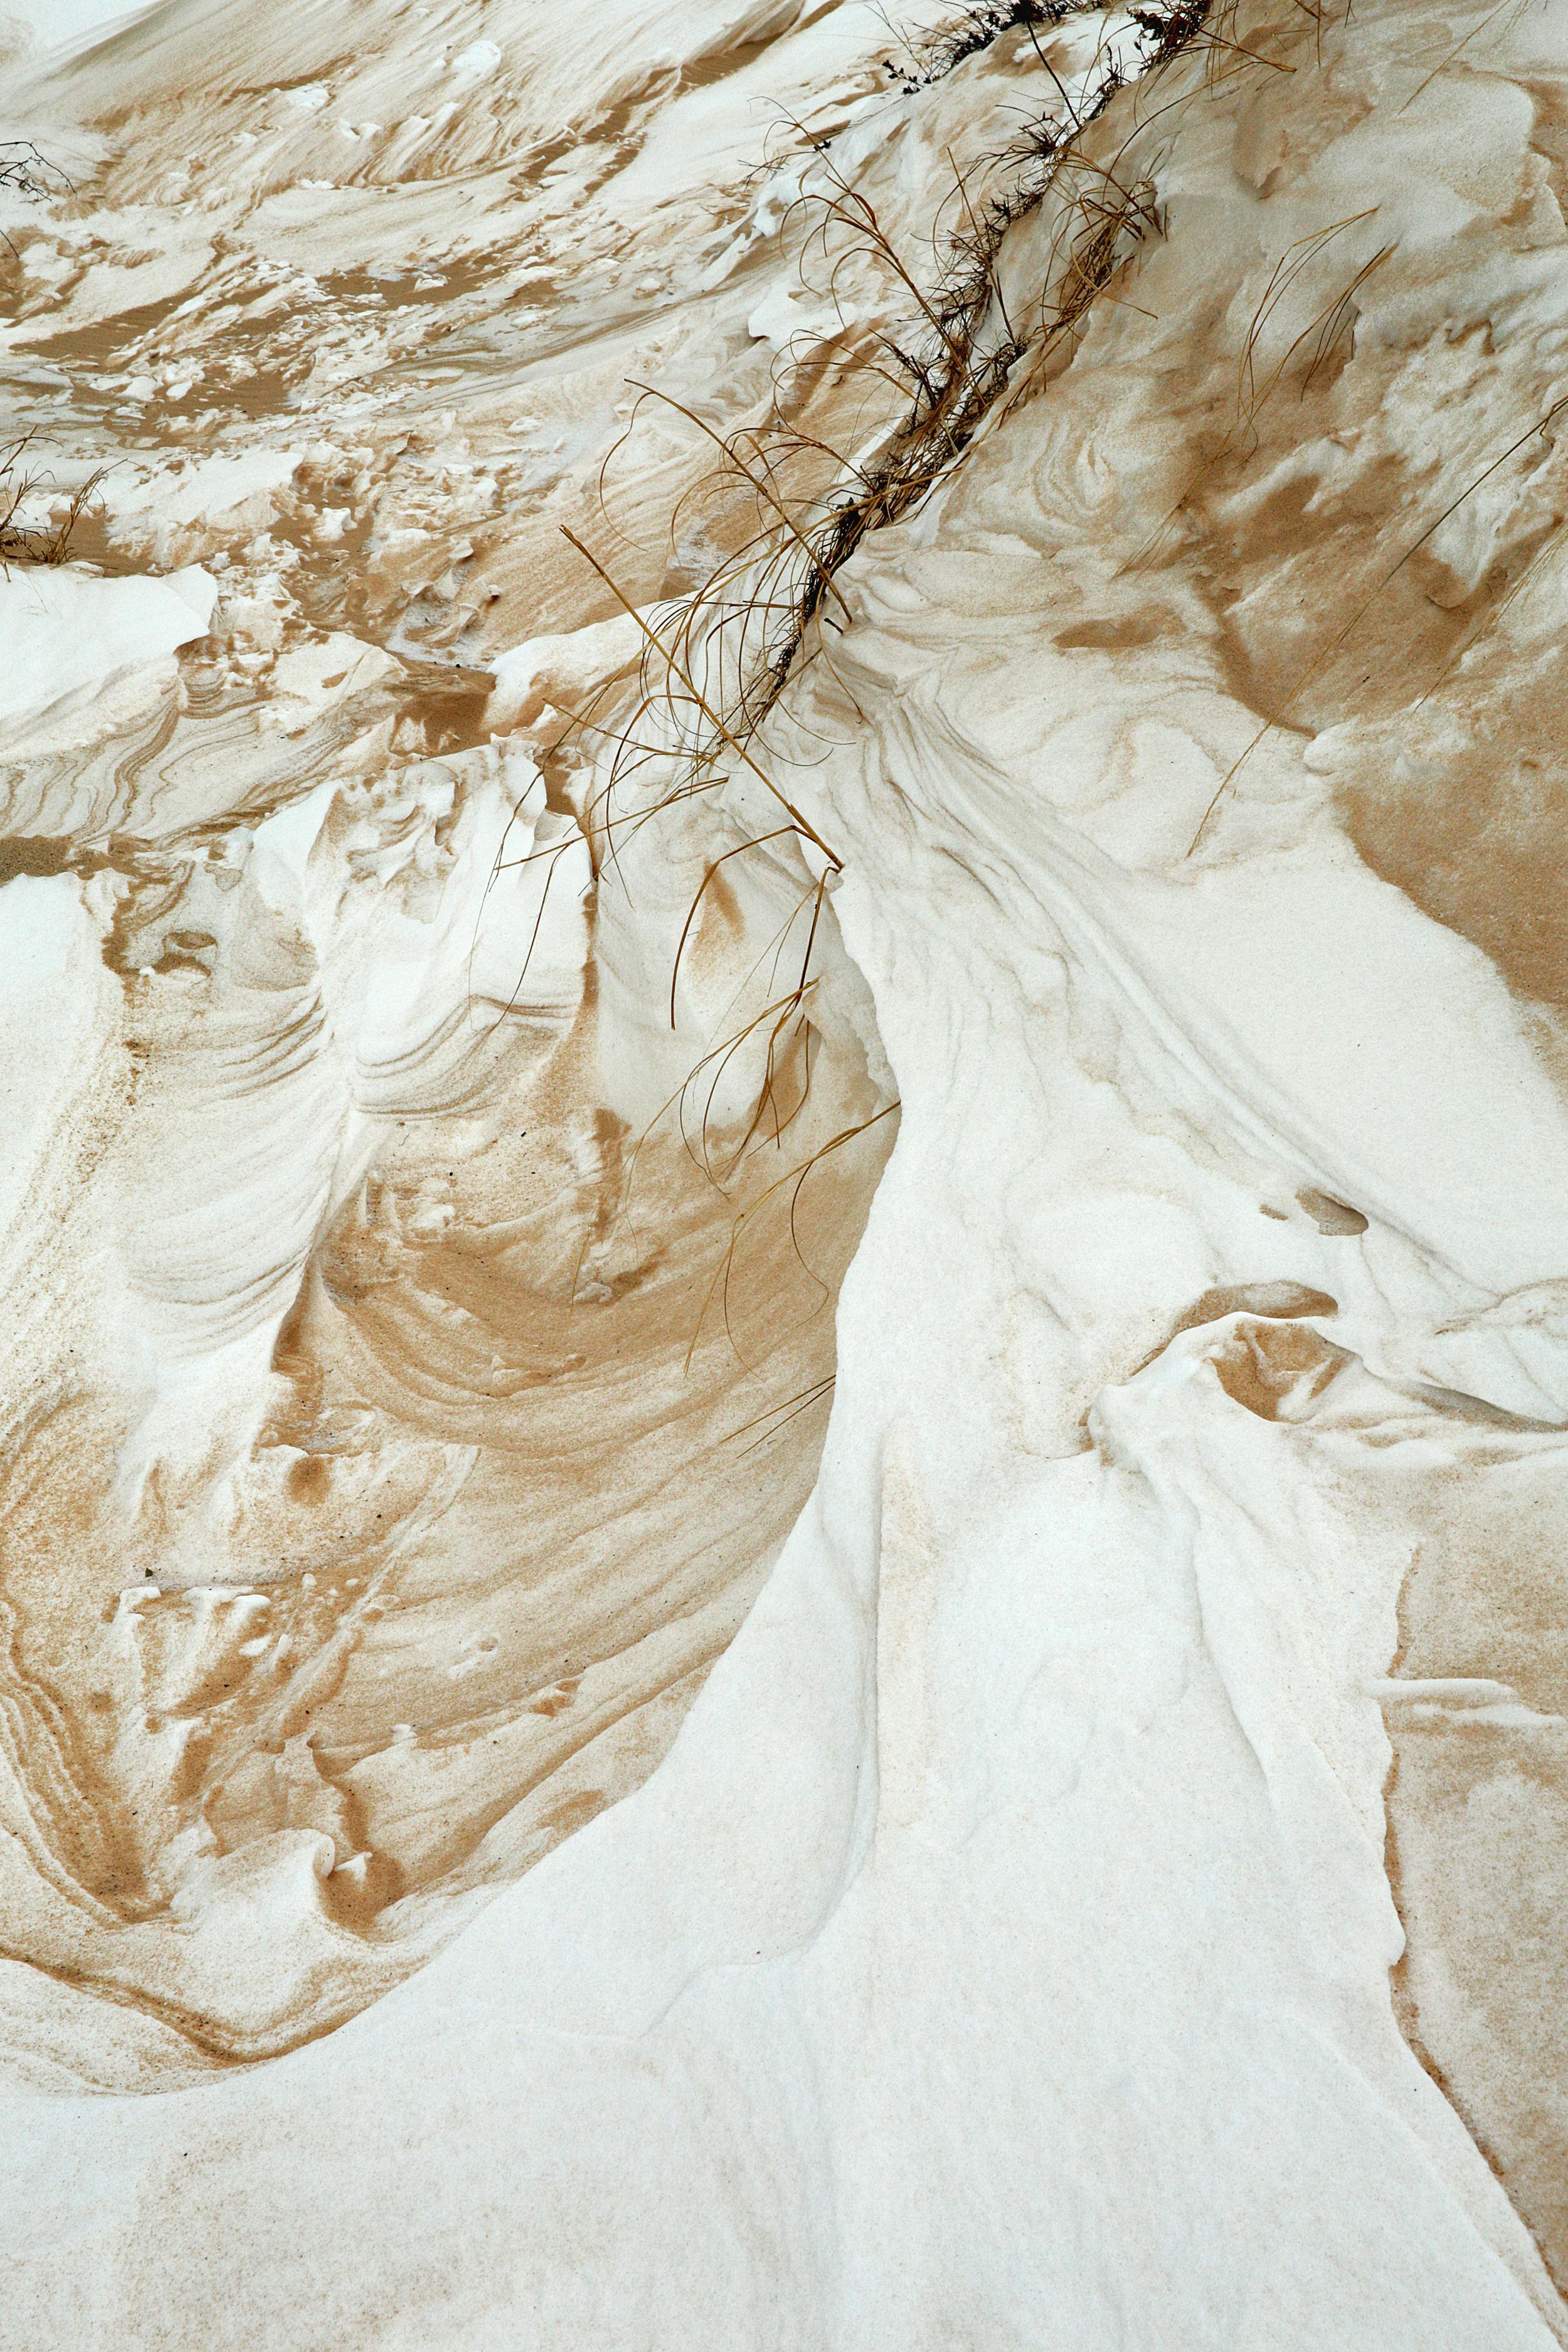 creamy sandy snow.jpg